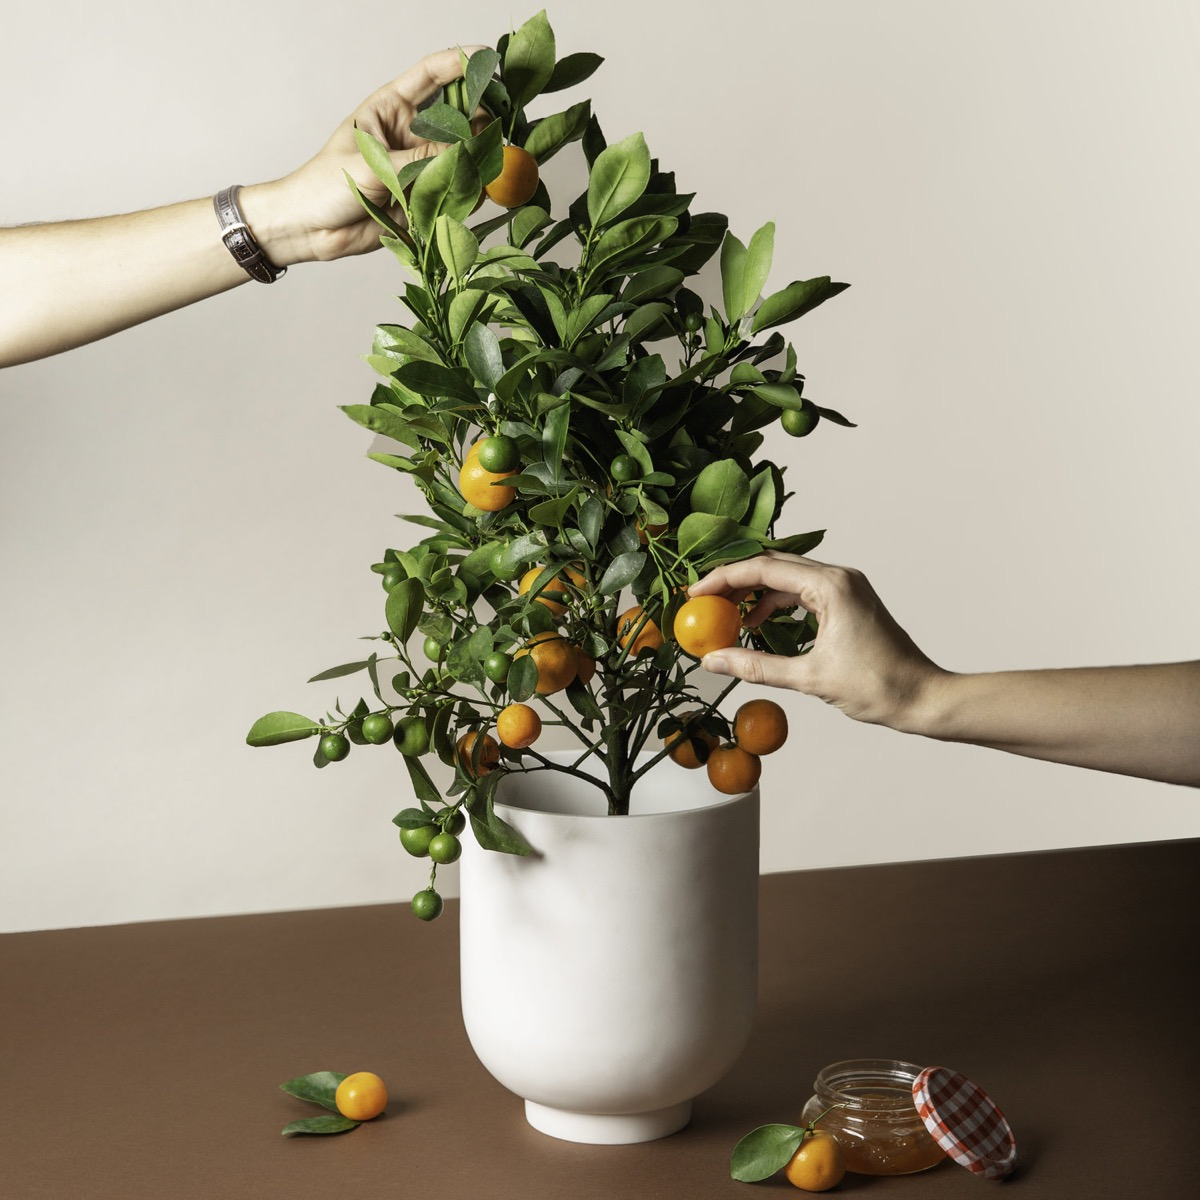 white hands pruning miniature citrus tree